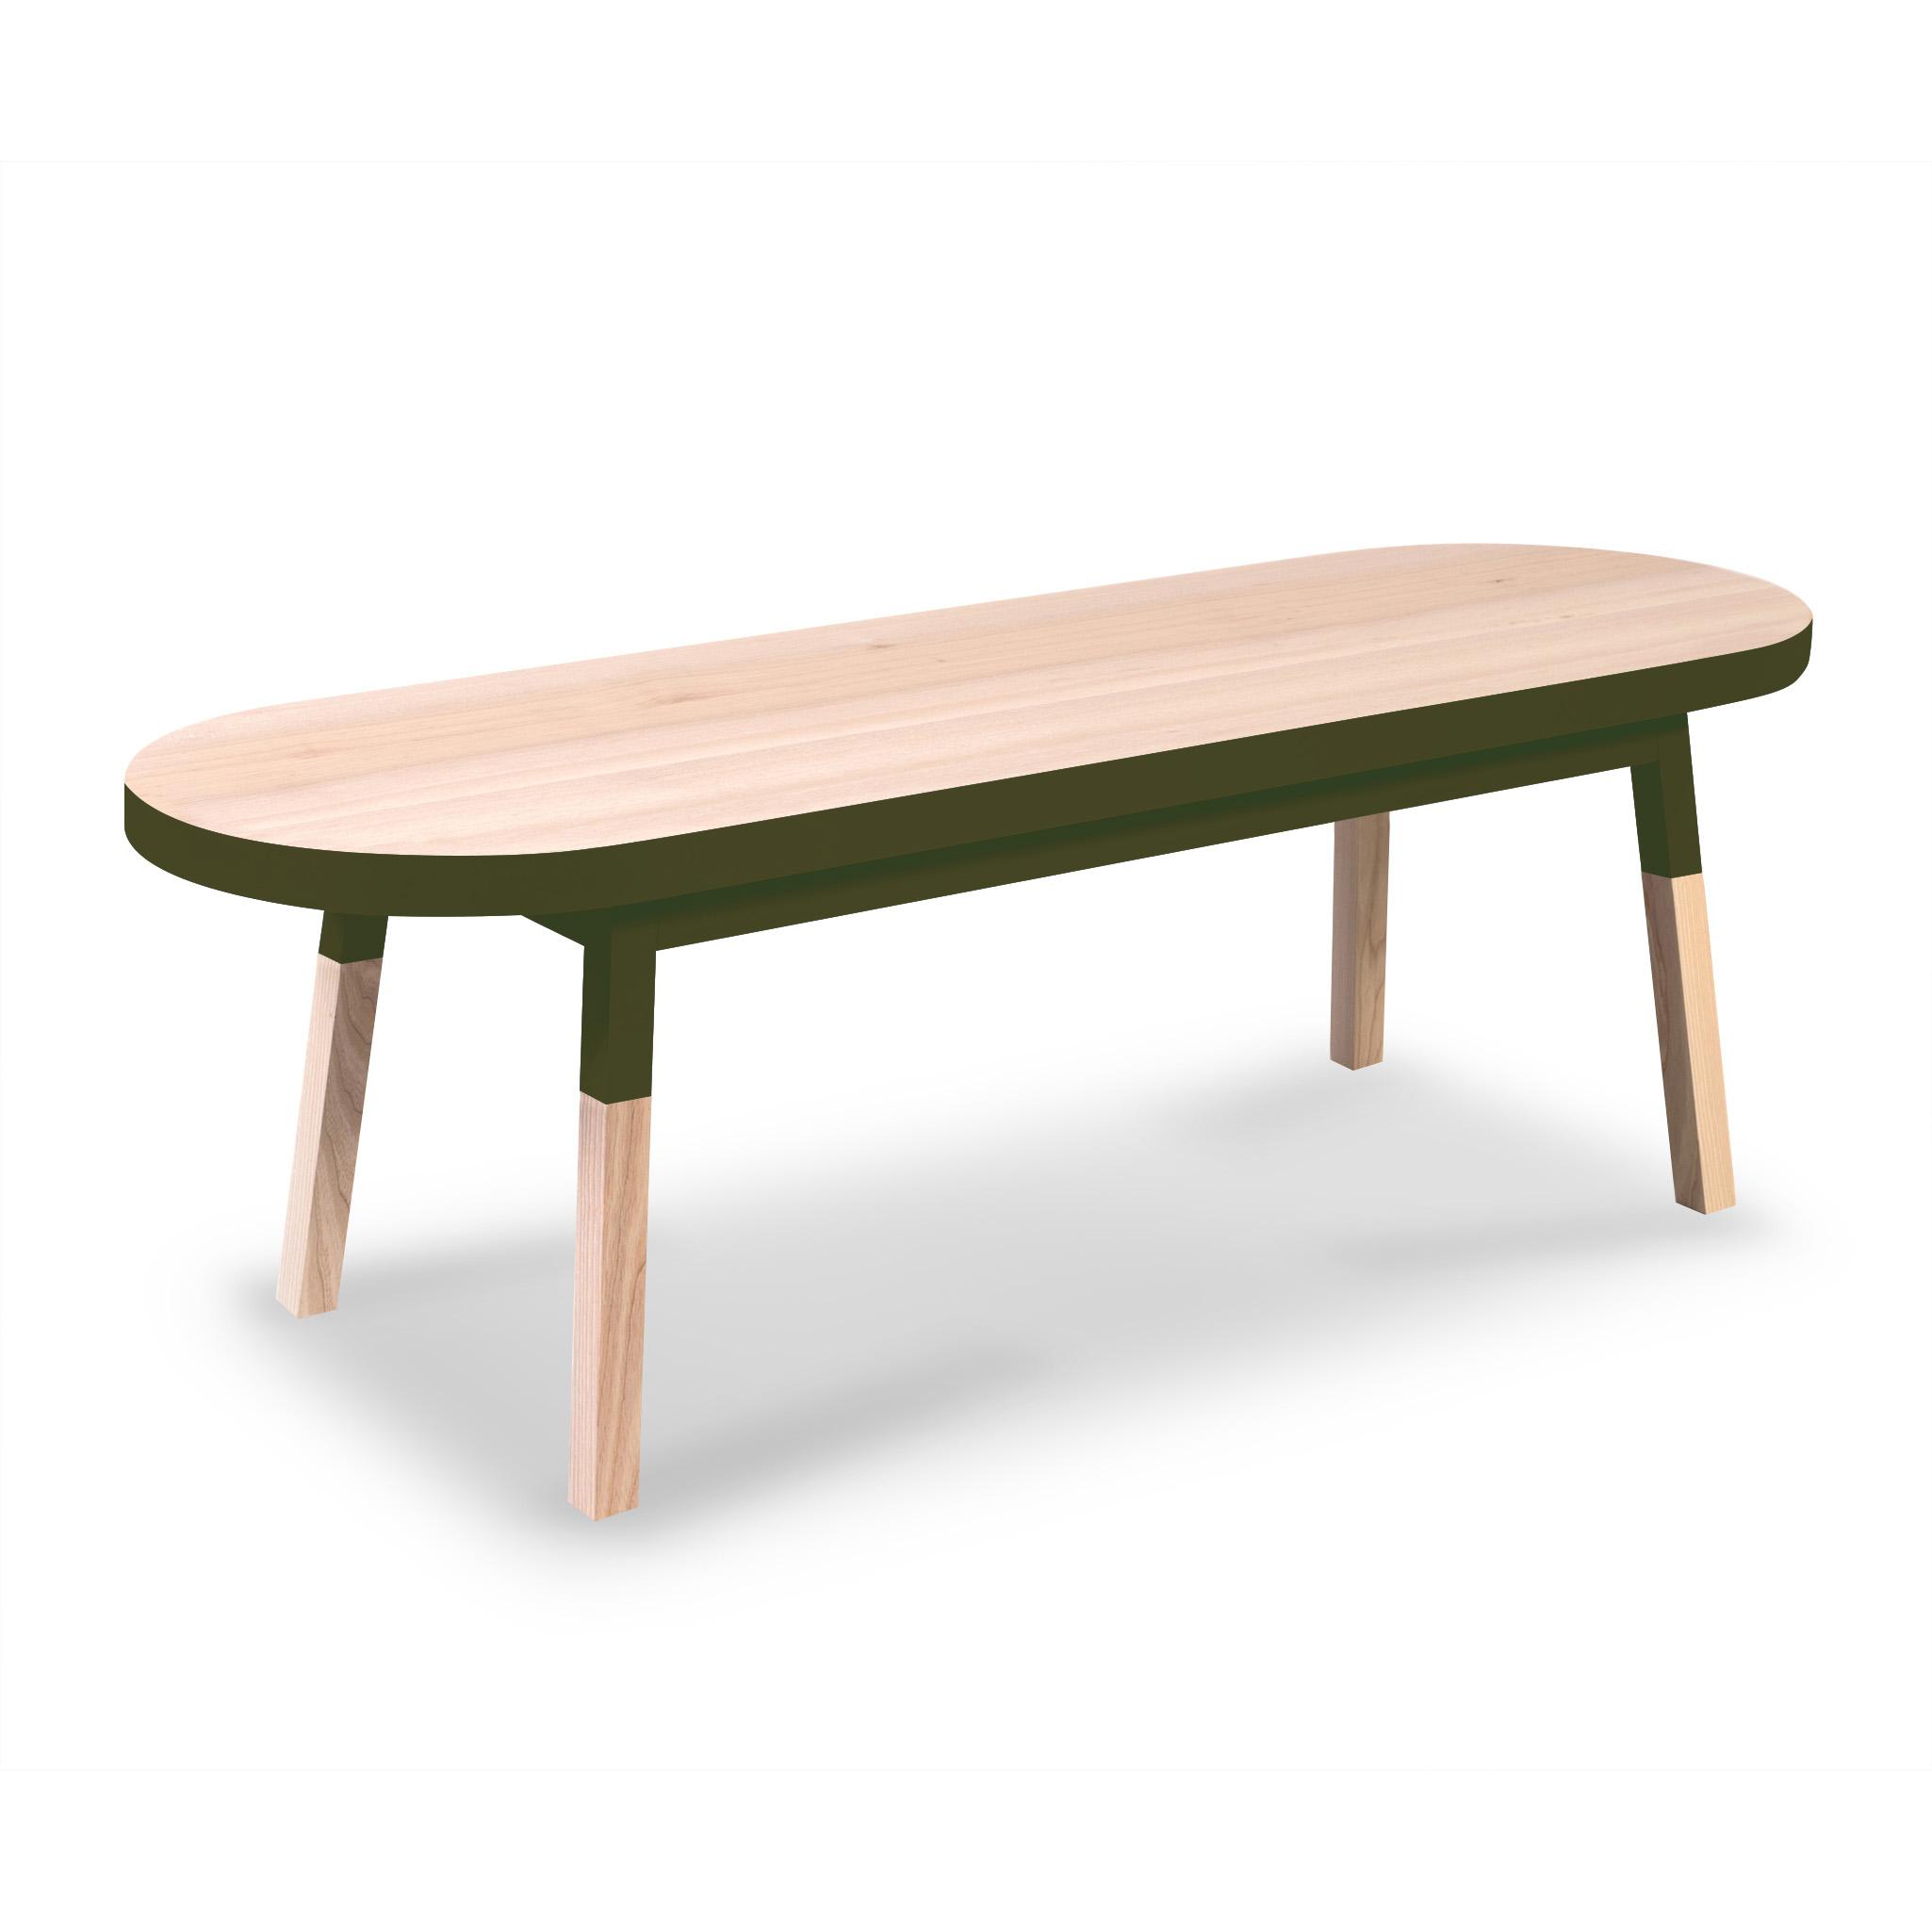 Table basse banc - 140 cm  - vert lancieux